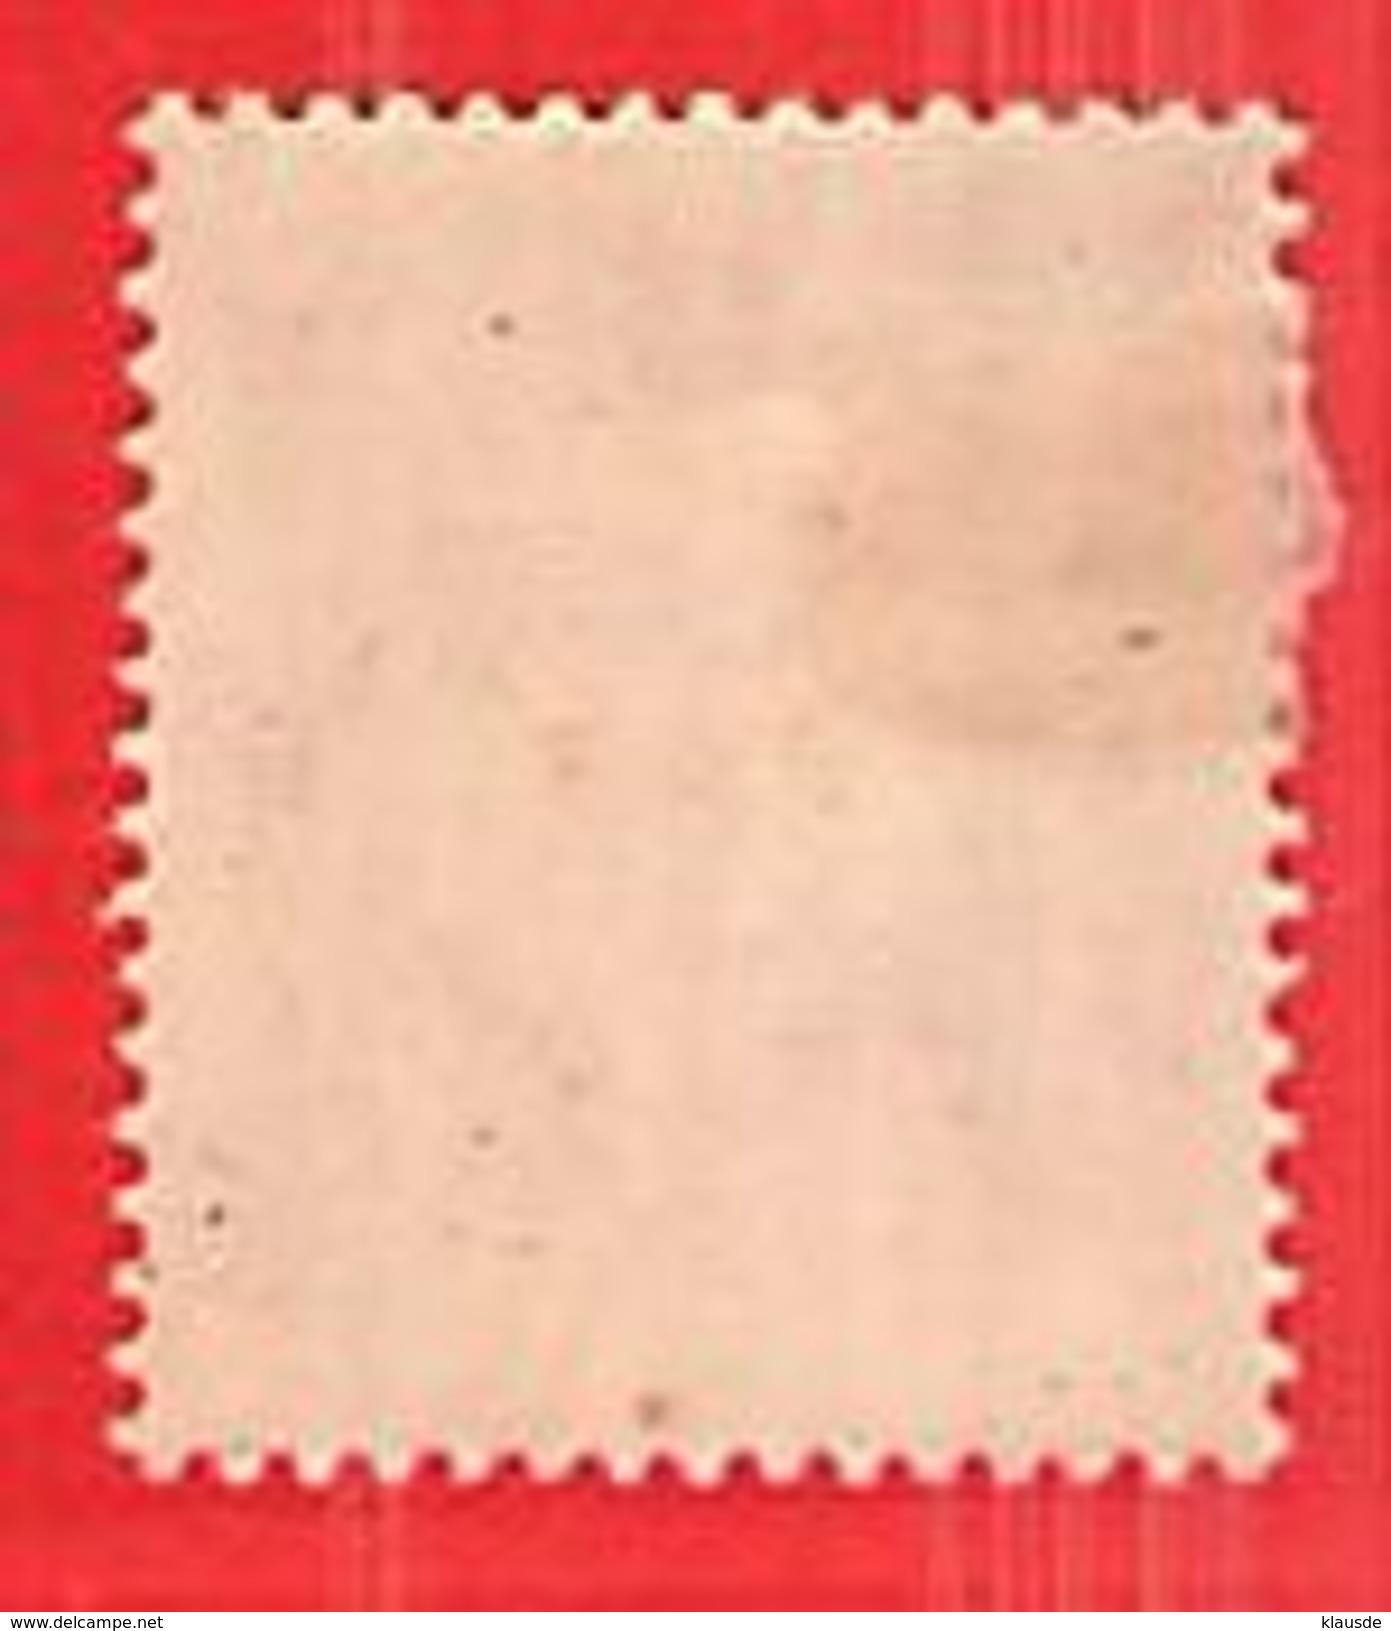 MiNr.99I X (Falz) Altdeutschland Bayern - Bayern